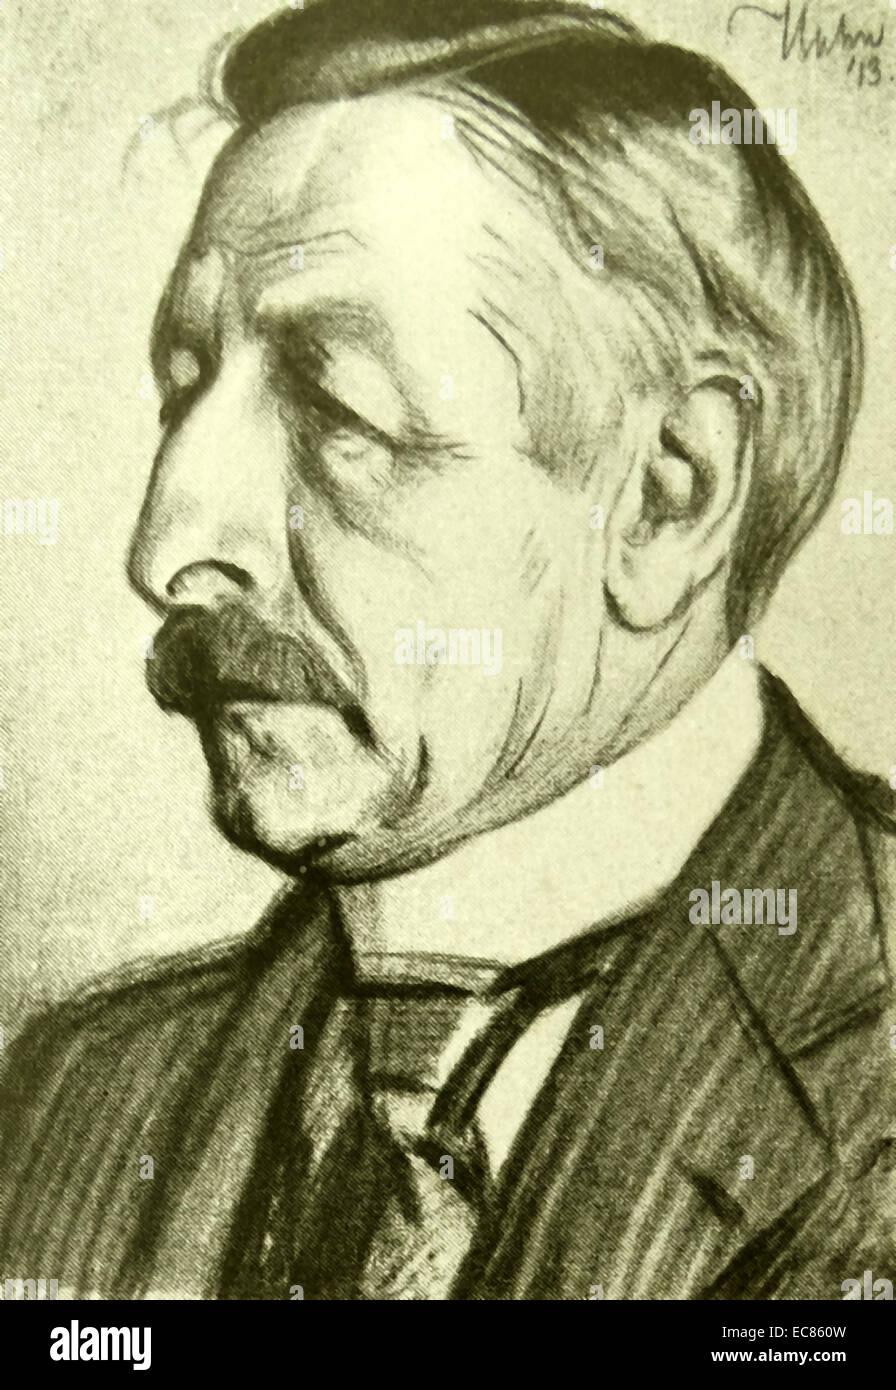 Pieter Jelles Troelstra 1860 1930 Dutch Politician Stock